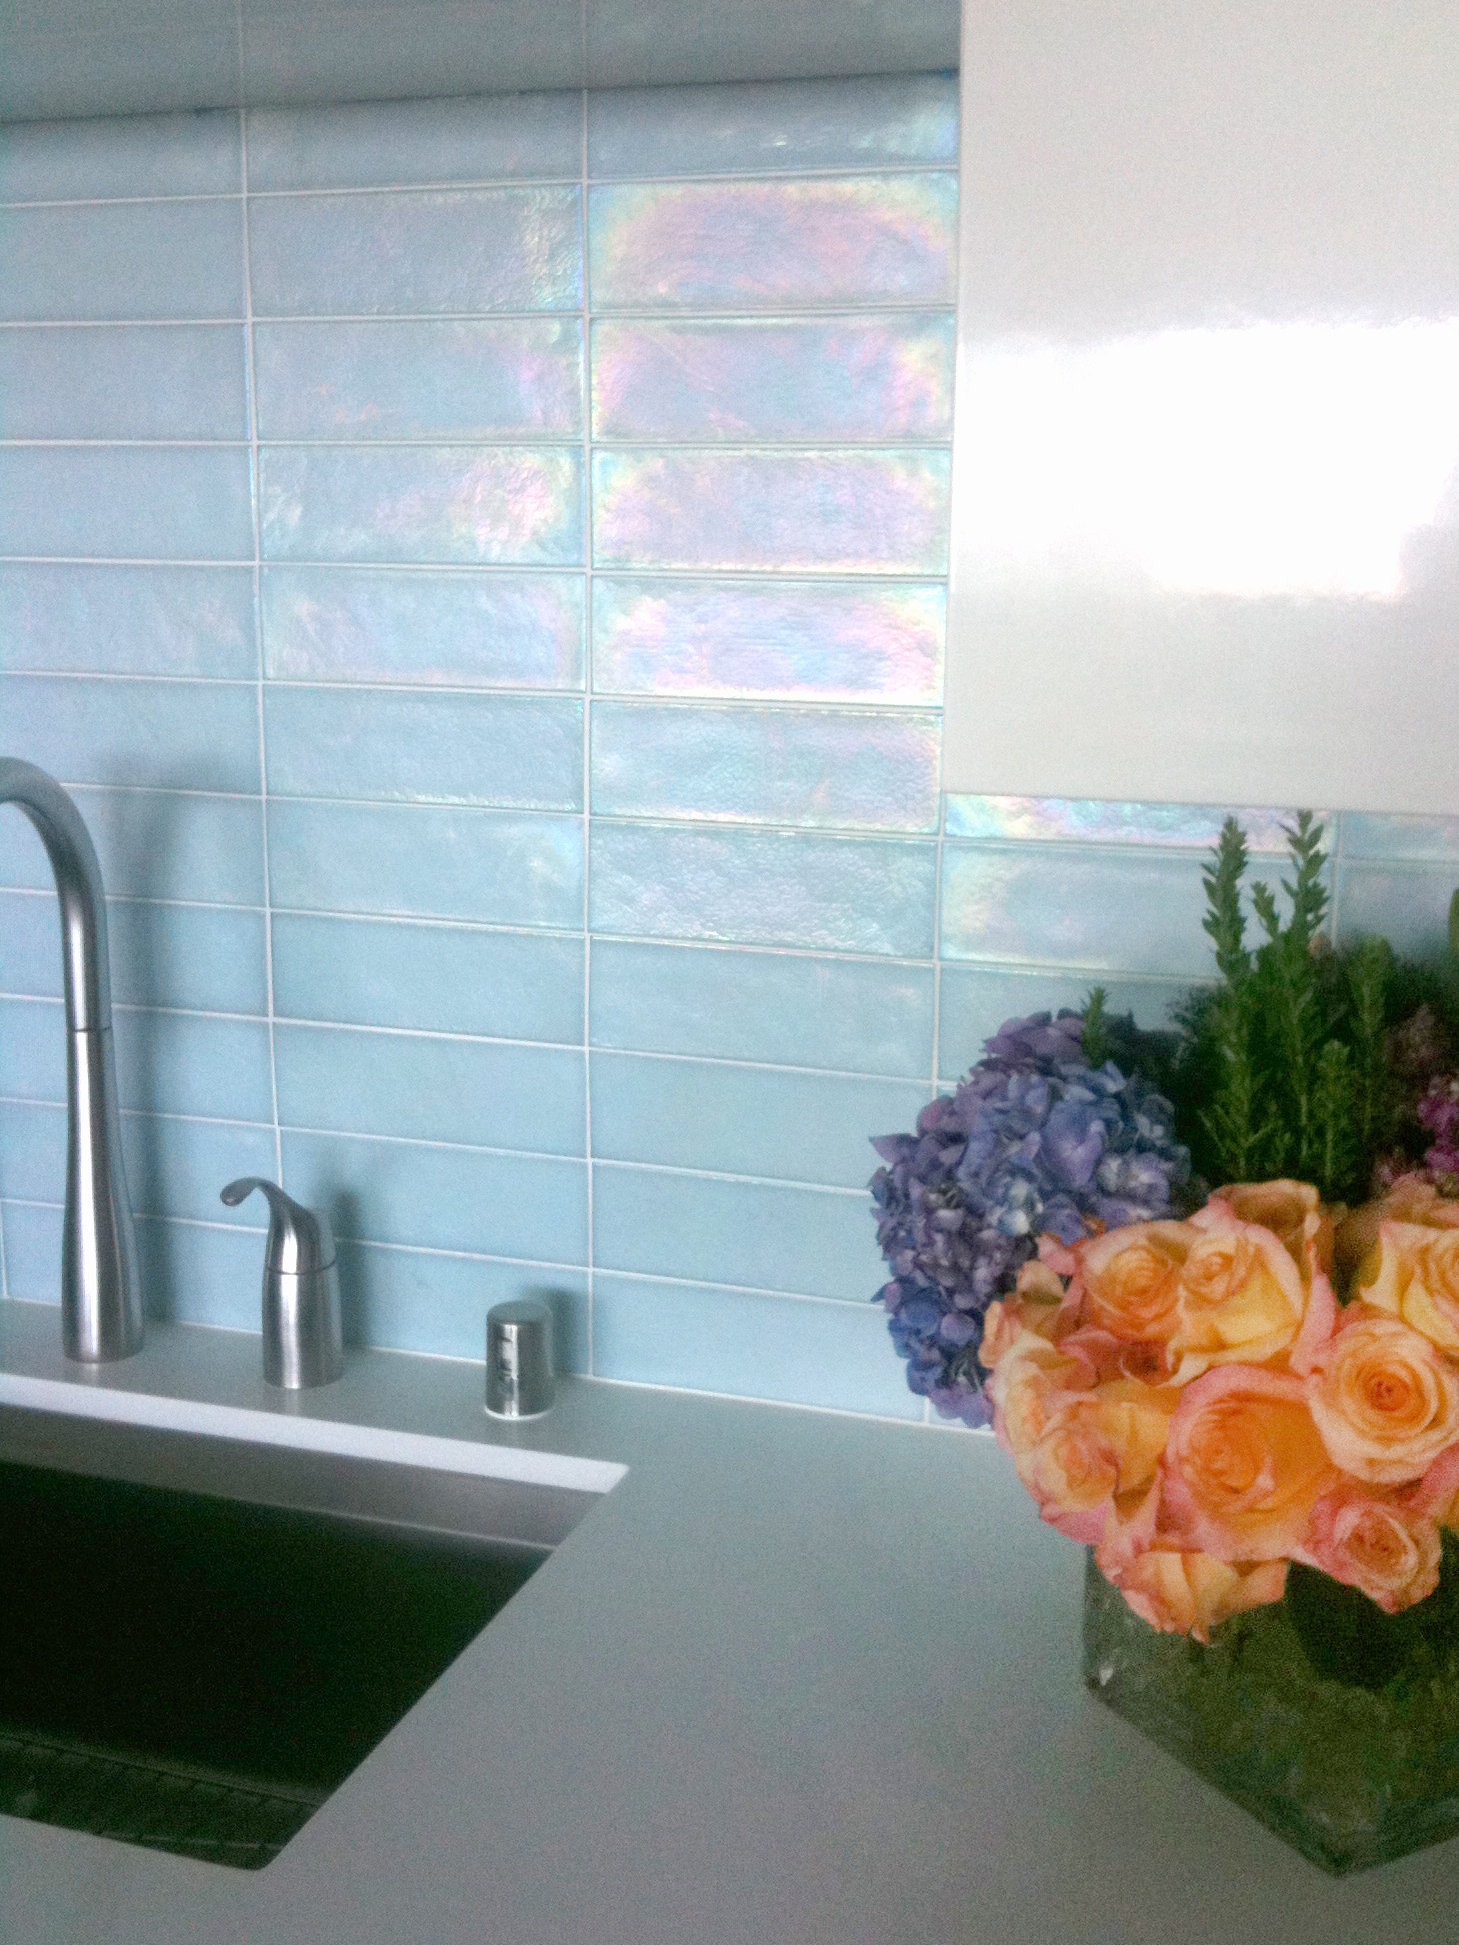 Generous 12X12 Acoustic Ceiling Tiles Thick 12X12 Vinyl Floor Tile Rectangular 16X16 Ceramic Tile 2 X 2 Ceramic Tile Old 2 X 6 Glass Subway Tile Fresh20 X 20 Floor Tile Patterns Kitchen Update: Add A Glass Tile Backsplash | HGTV